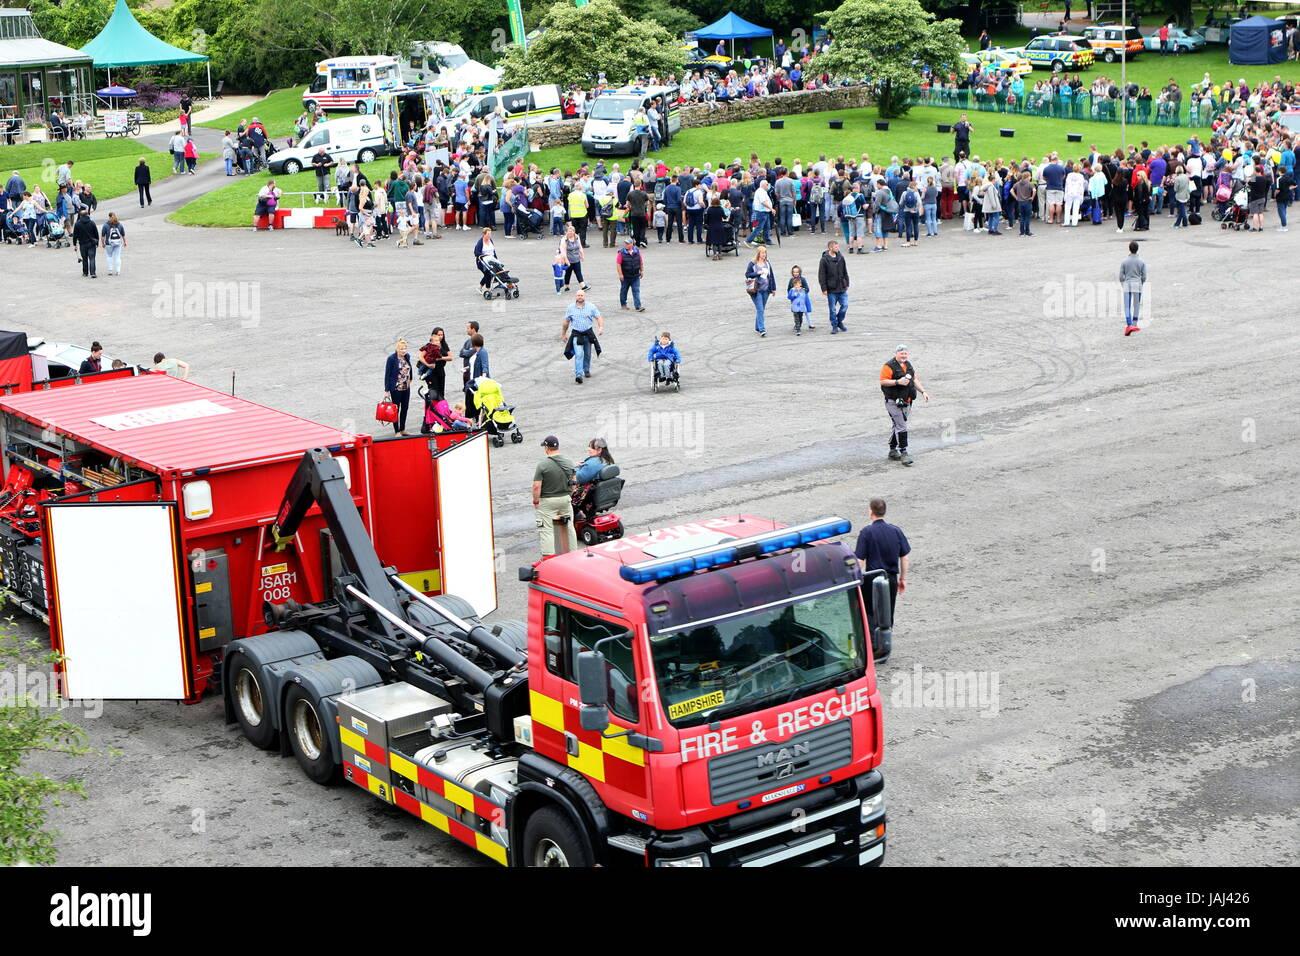 Beaulieu, Hampshire, UK - 29. Mai 2017: Besucher und Einsatzfahrzeuge 999 2017 an das National Motor Museum zeigen Stockbild